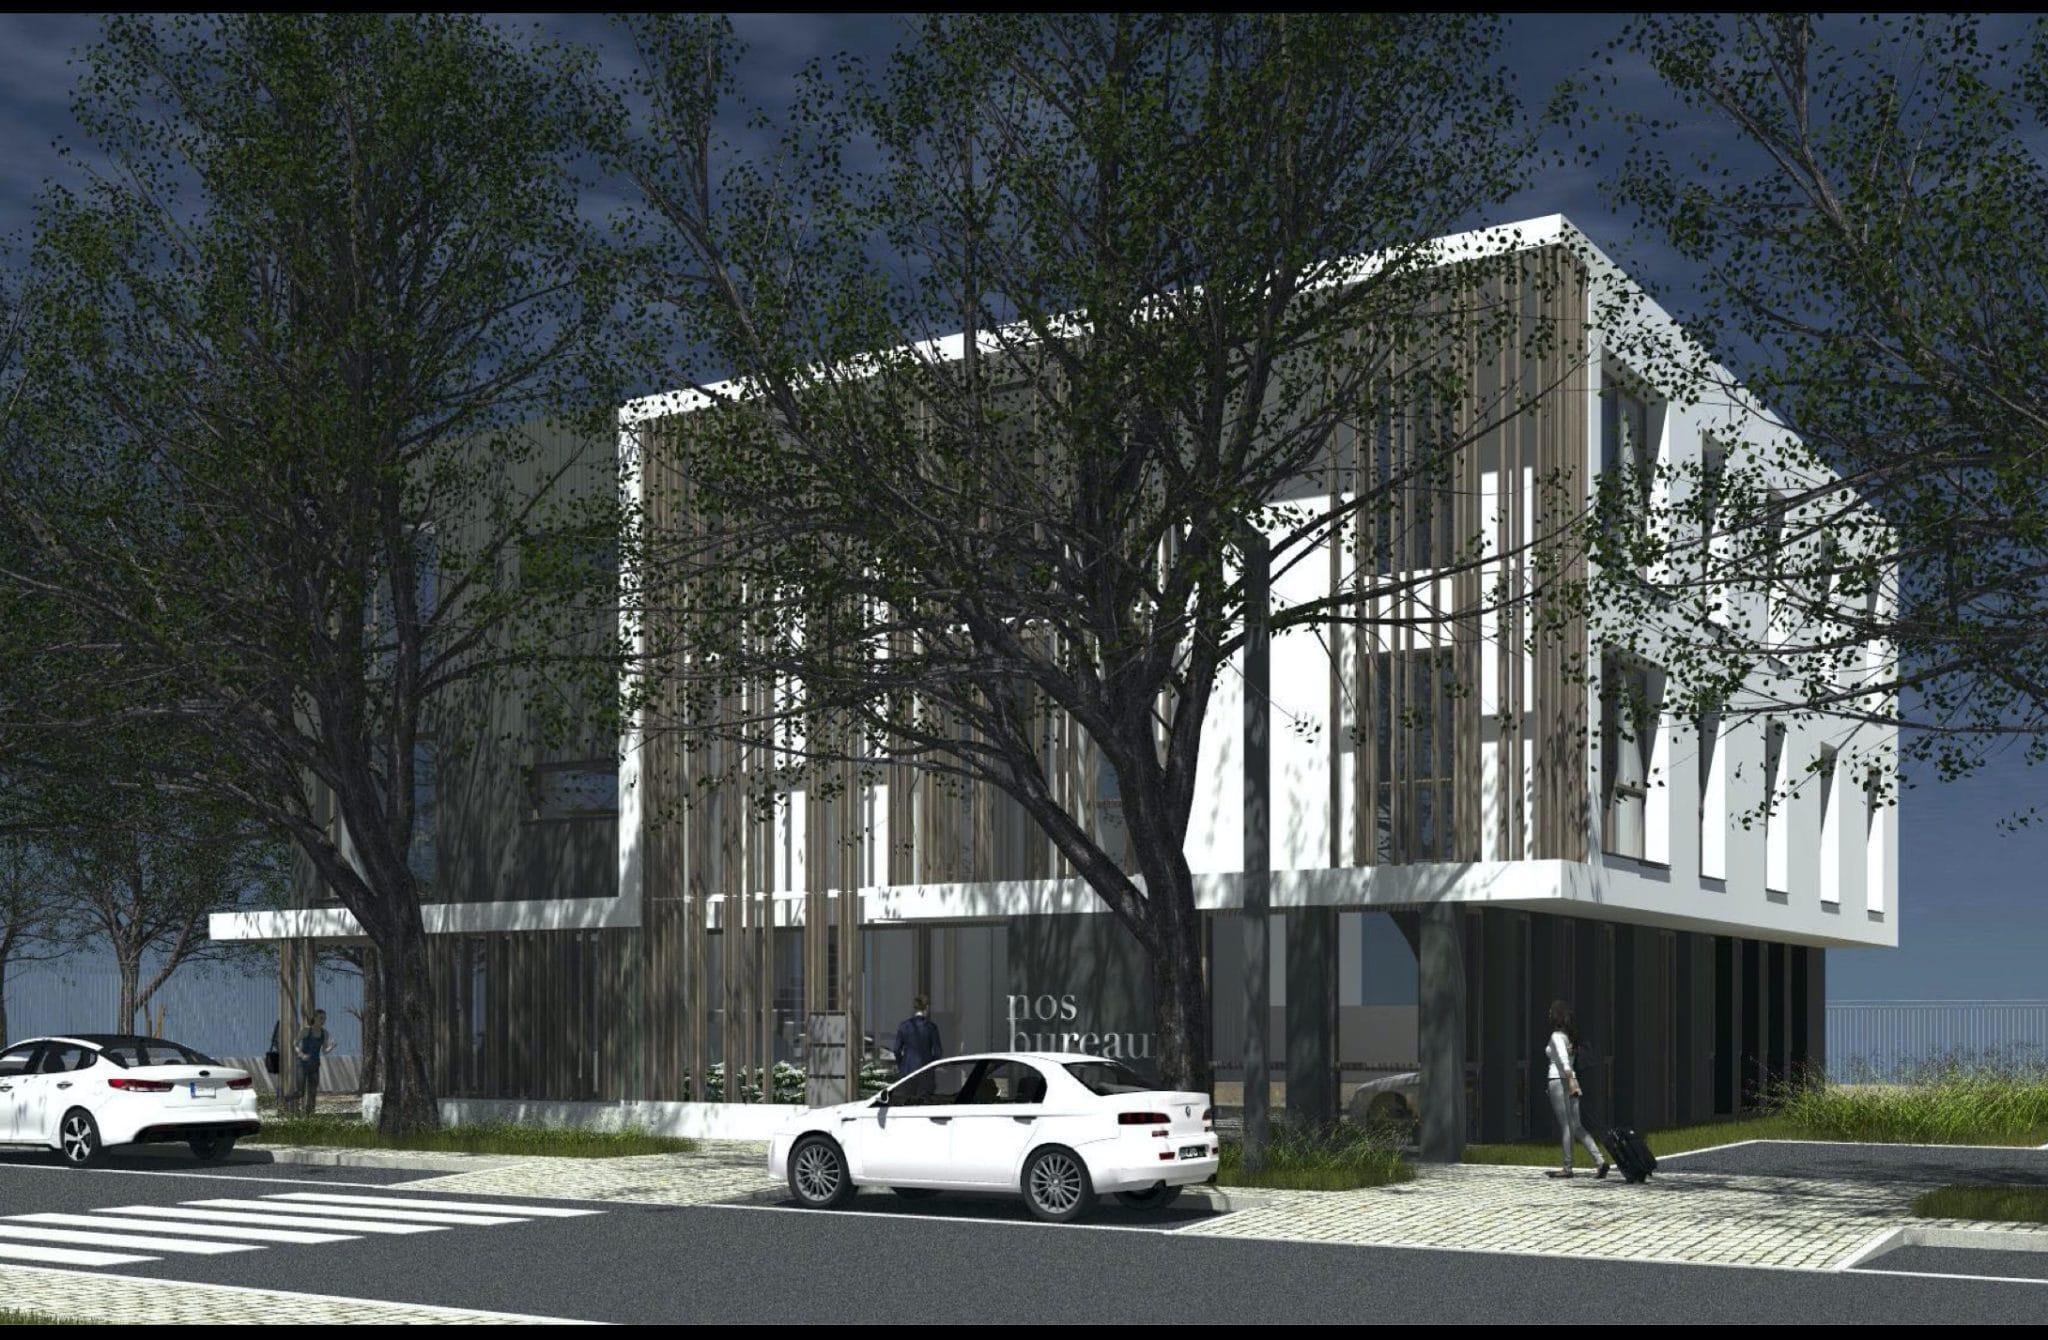 Bâtiment Espaces Tertiaires Lahitolle (projet)